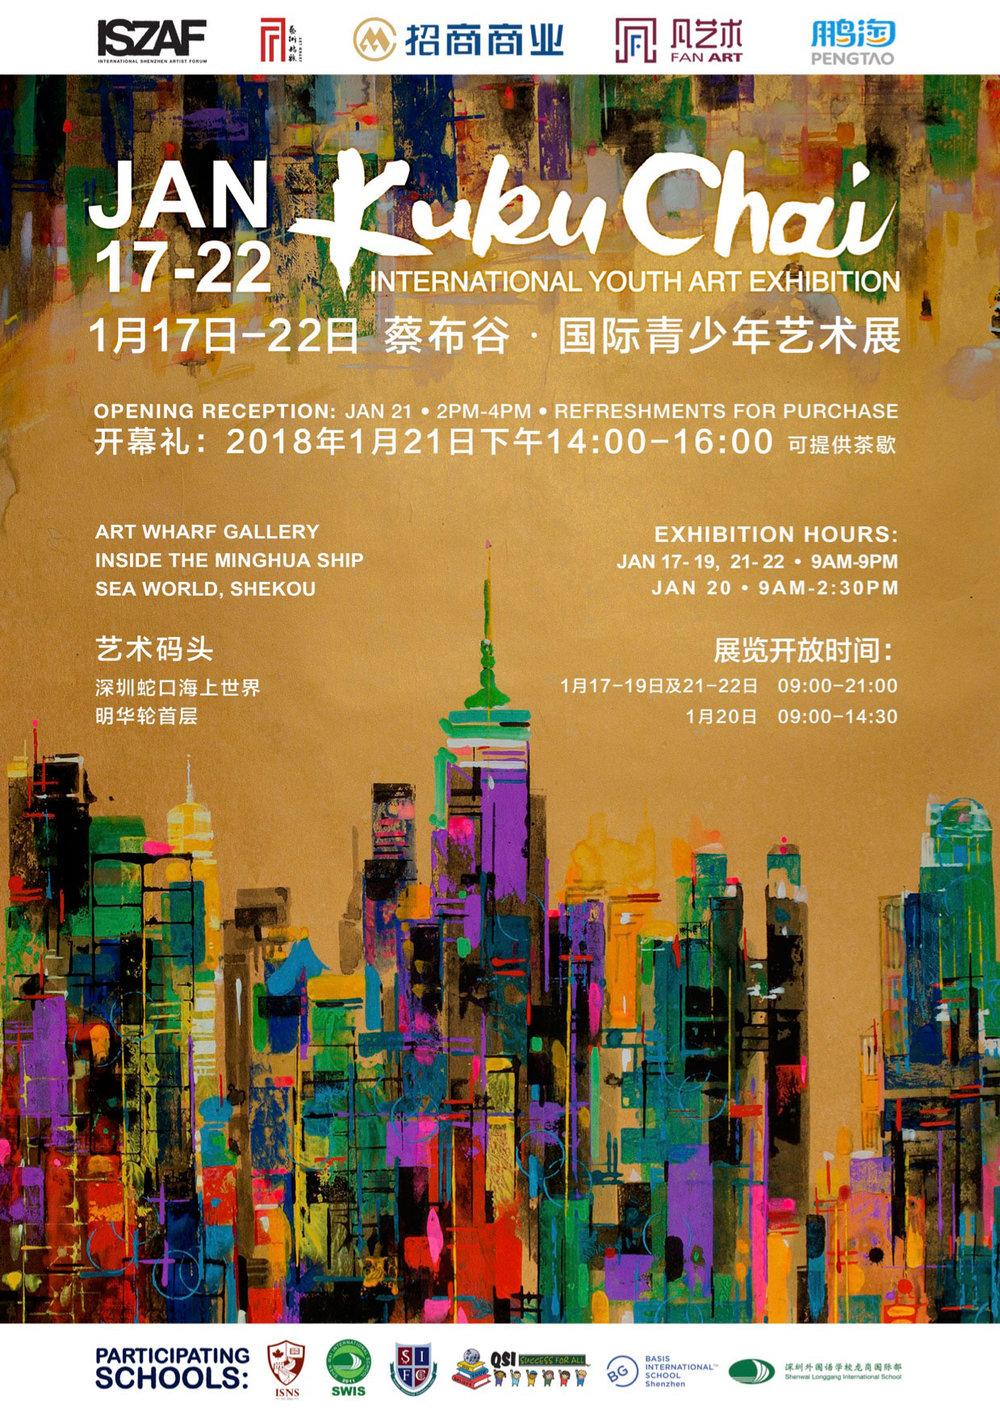 Kuku Chai International Youth Art Exhibition Logo and Poster. 2018.